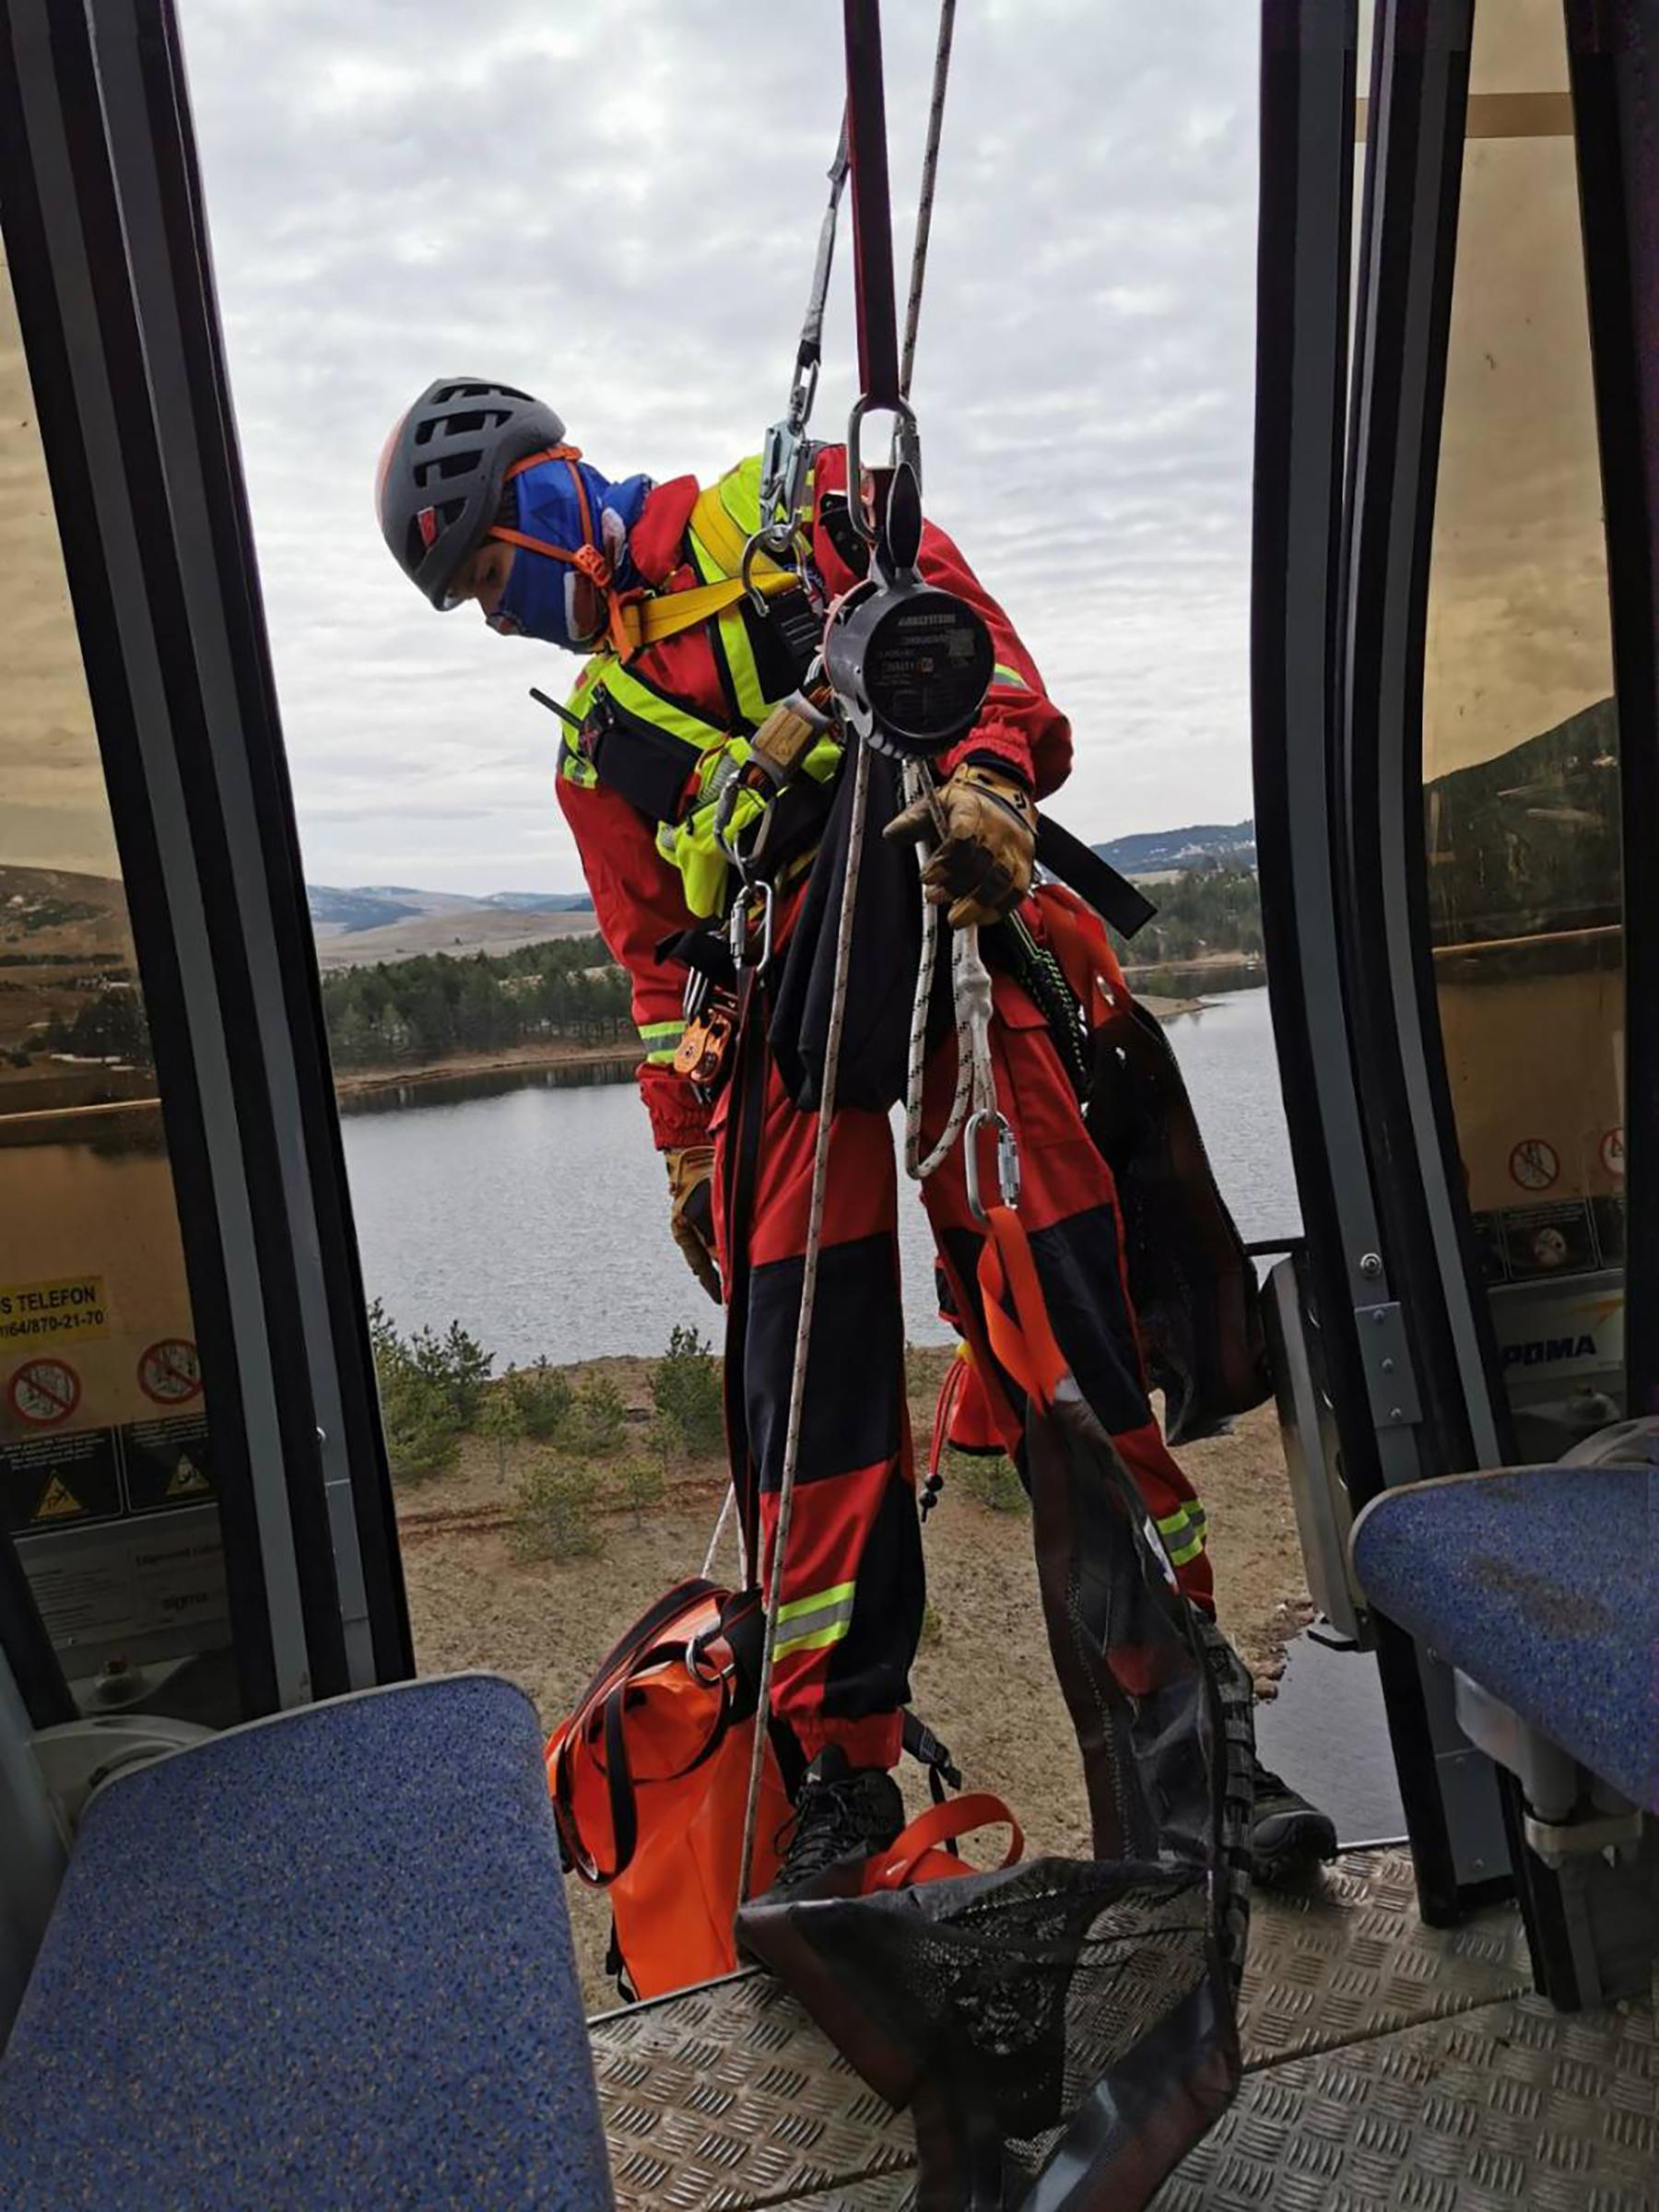 Gondola, Gorska služba spasavanja